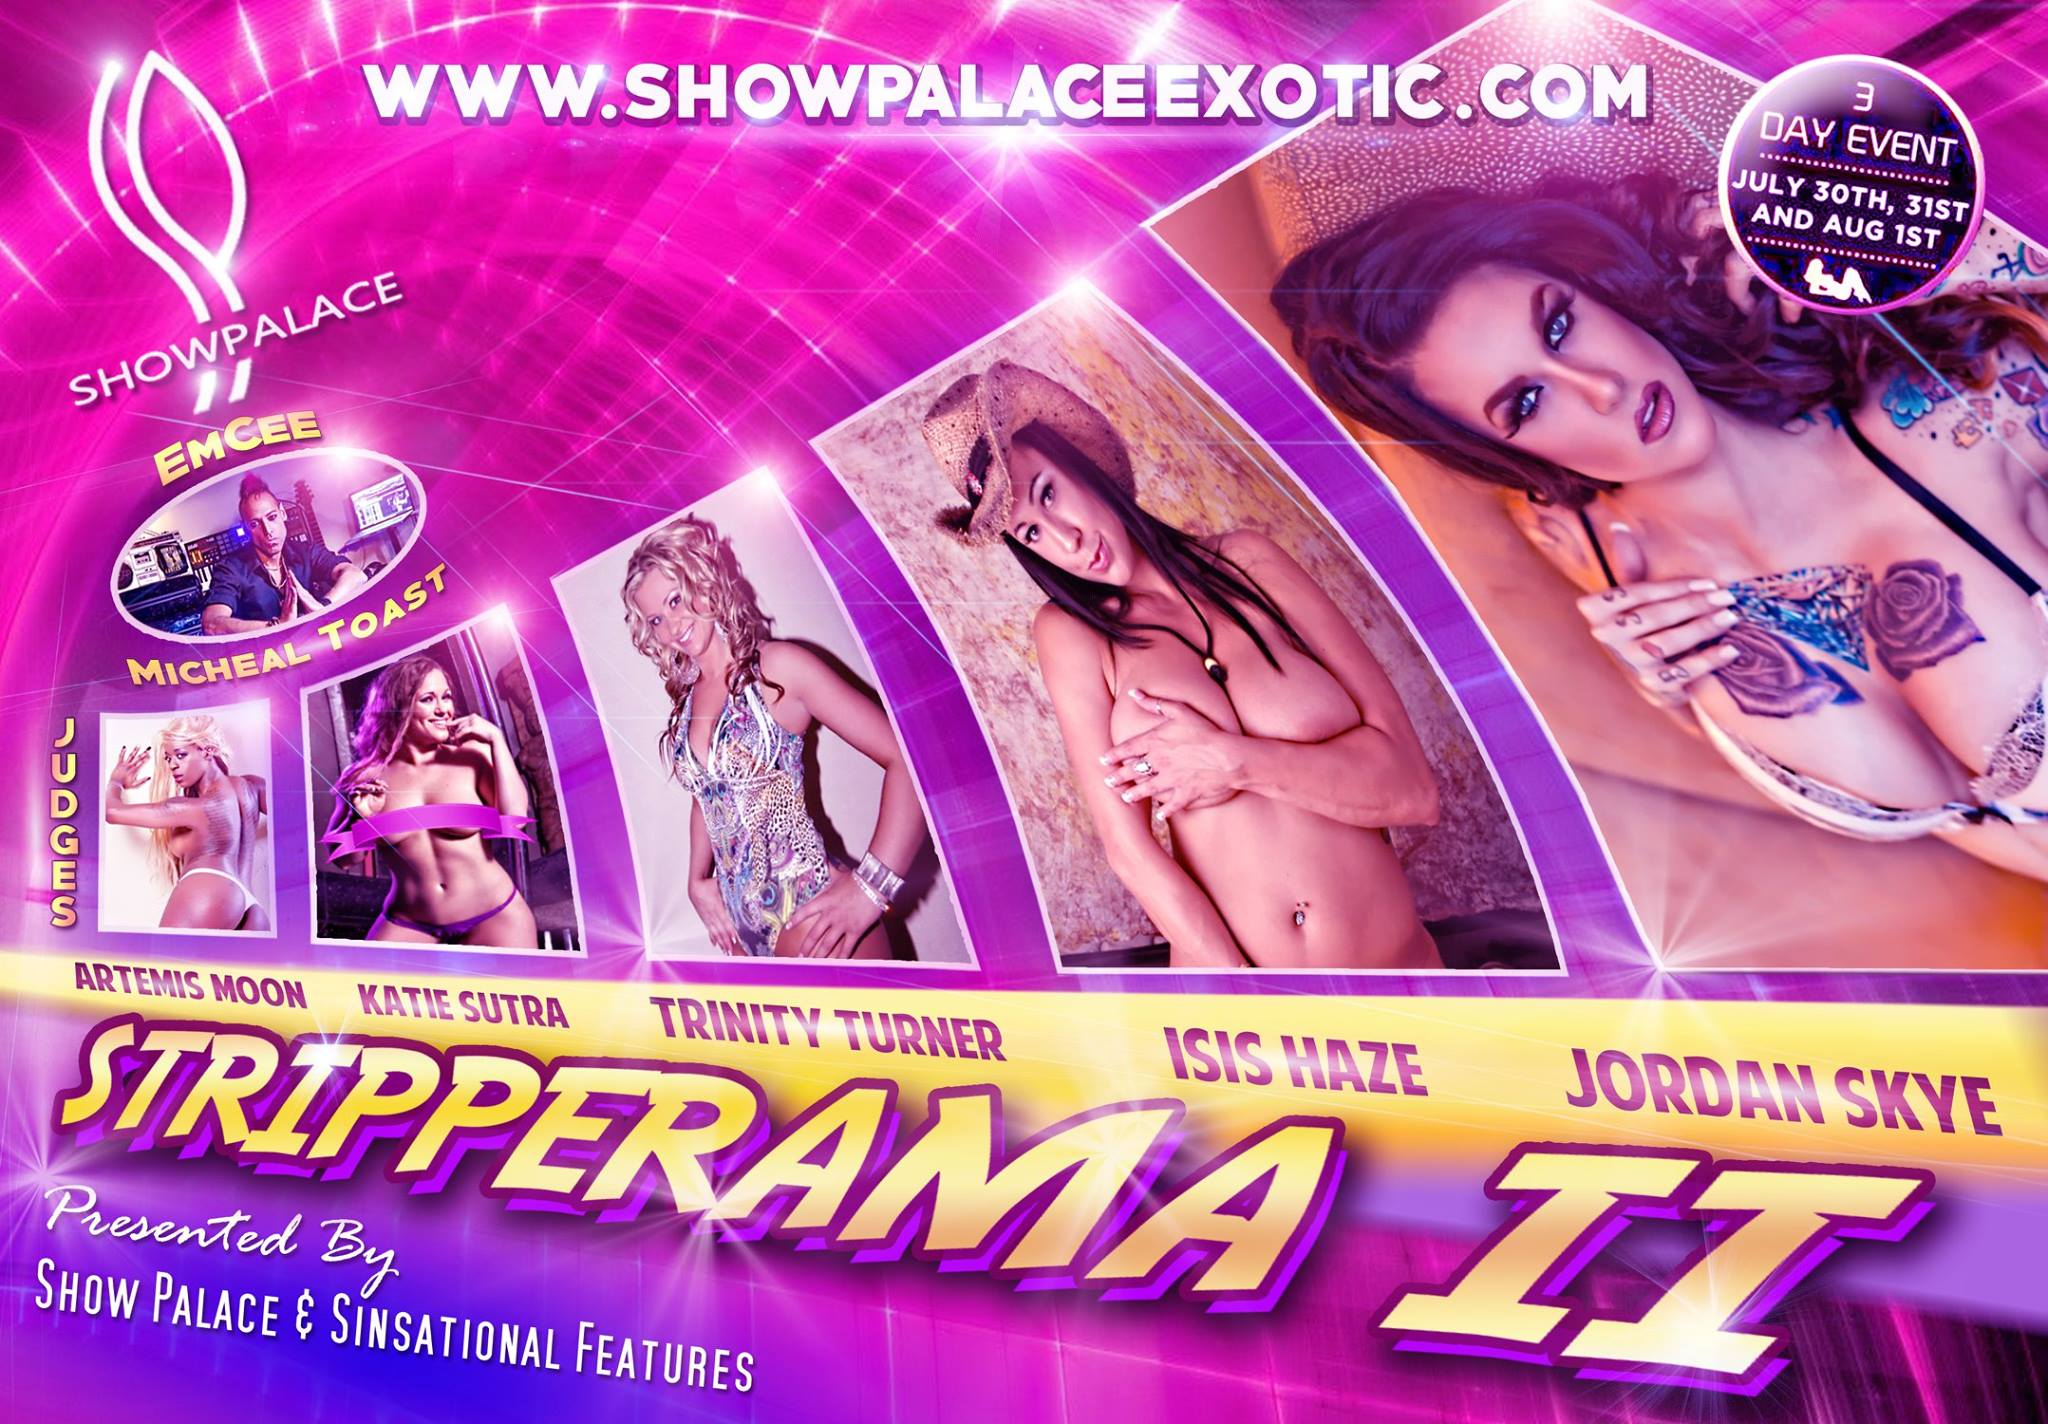 Stripper Rama Flyer